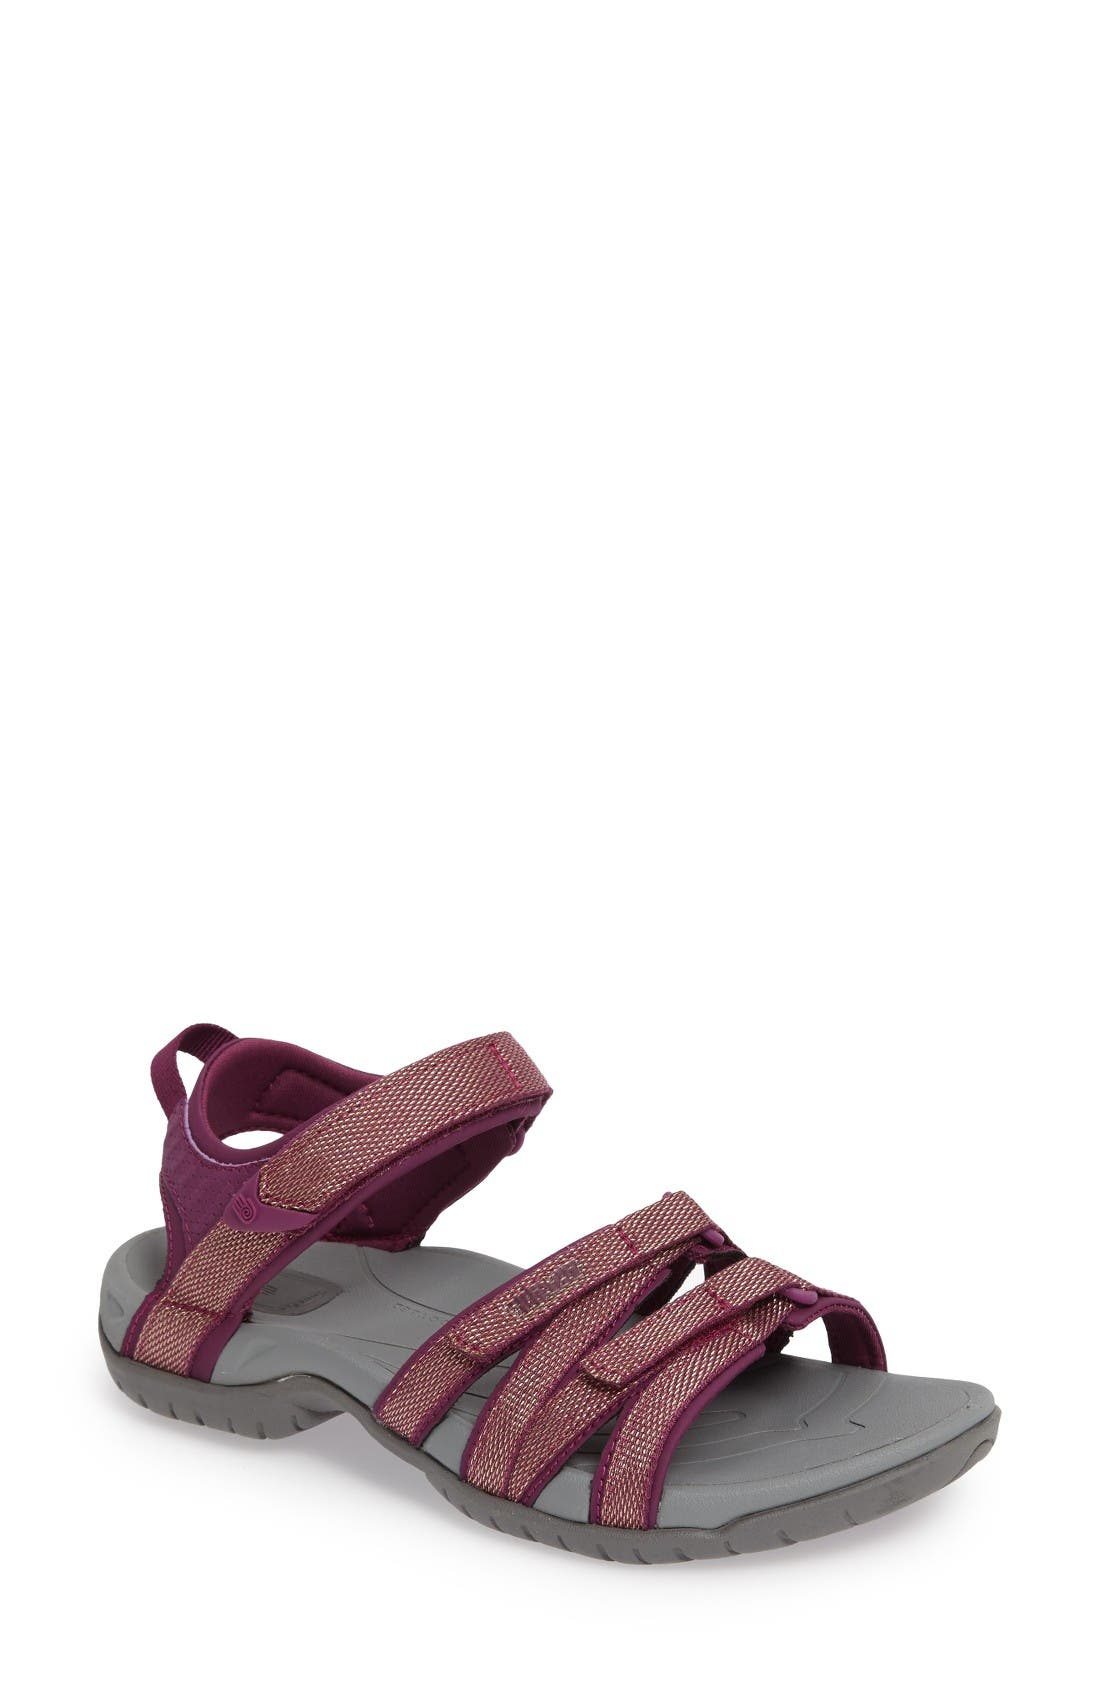 Main Image - Teva 'Tirra' Sandal (Women)